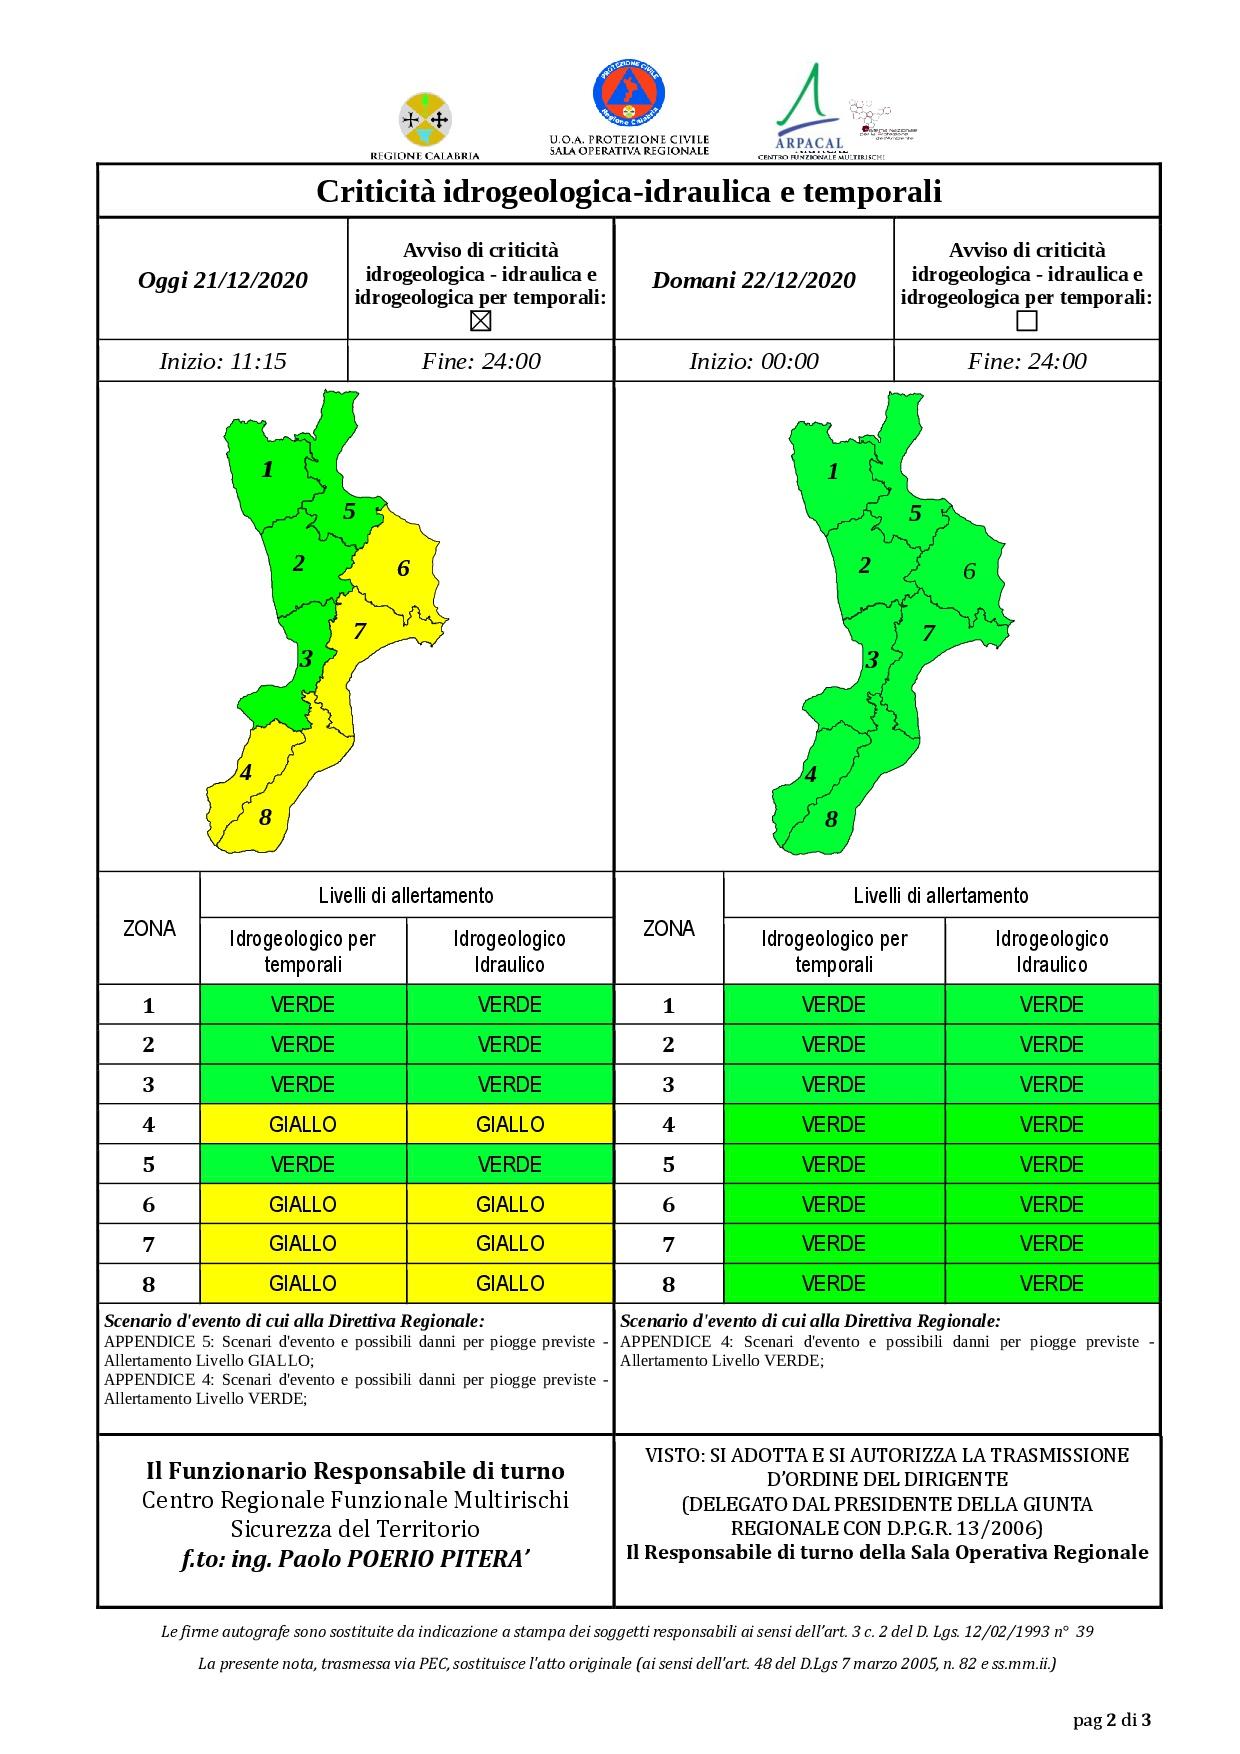 Criticità idrogeologica-idraulica e temporali in Calabria 21-12-2020